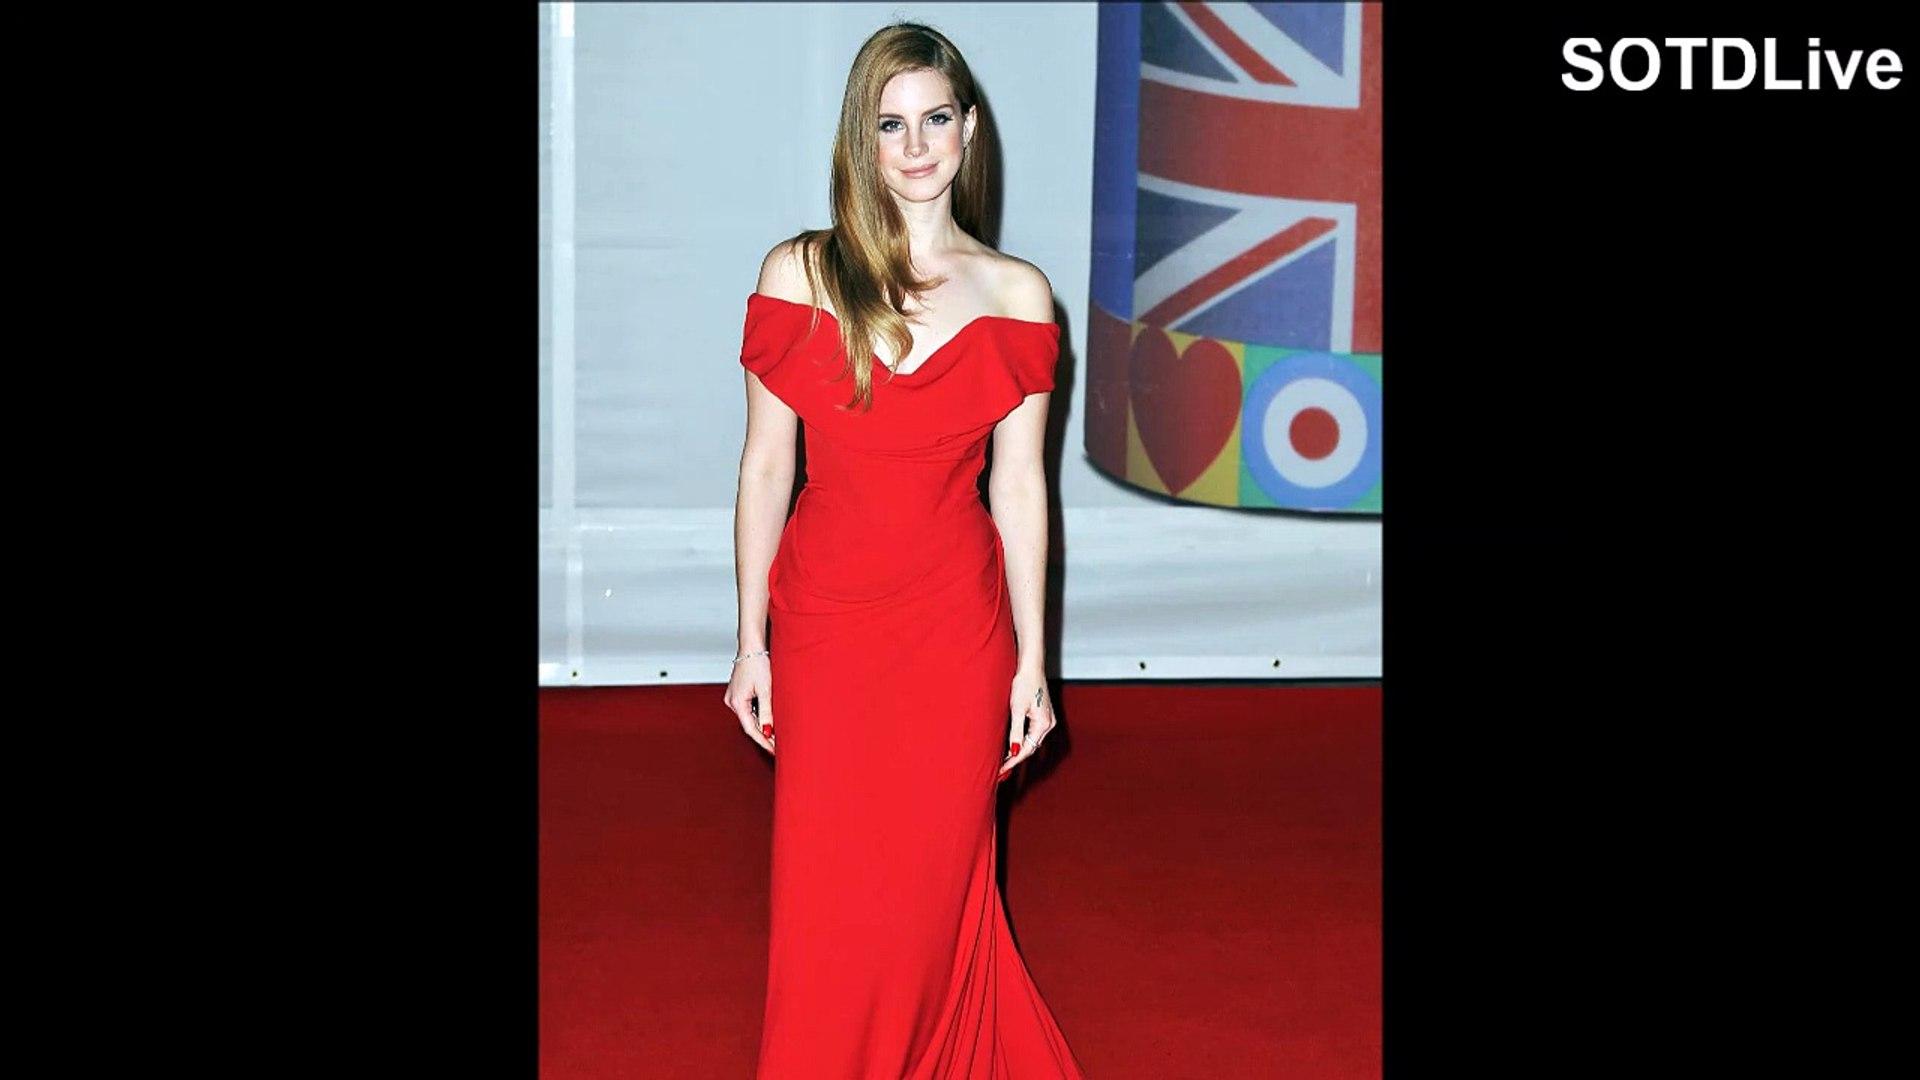 LANA DEL REY looks RAVISHING in RED DRESS | SOTDLive | Episode 1